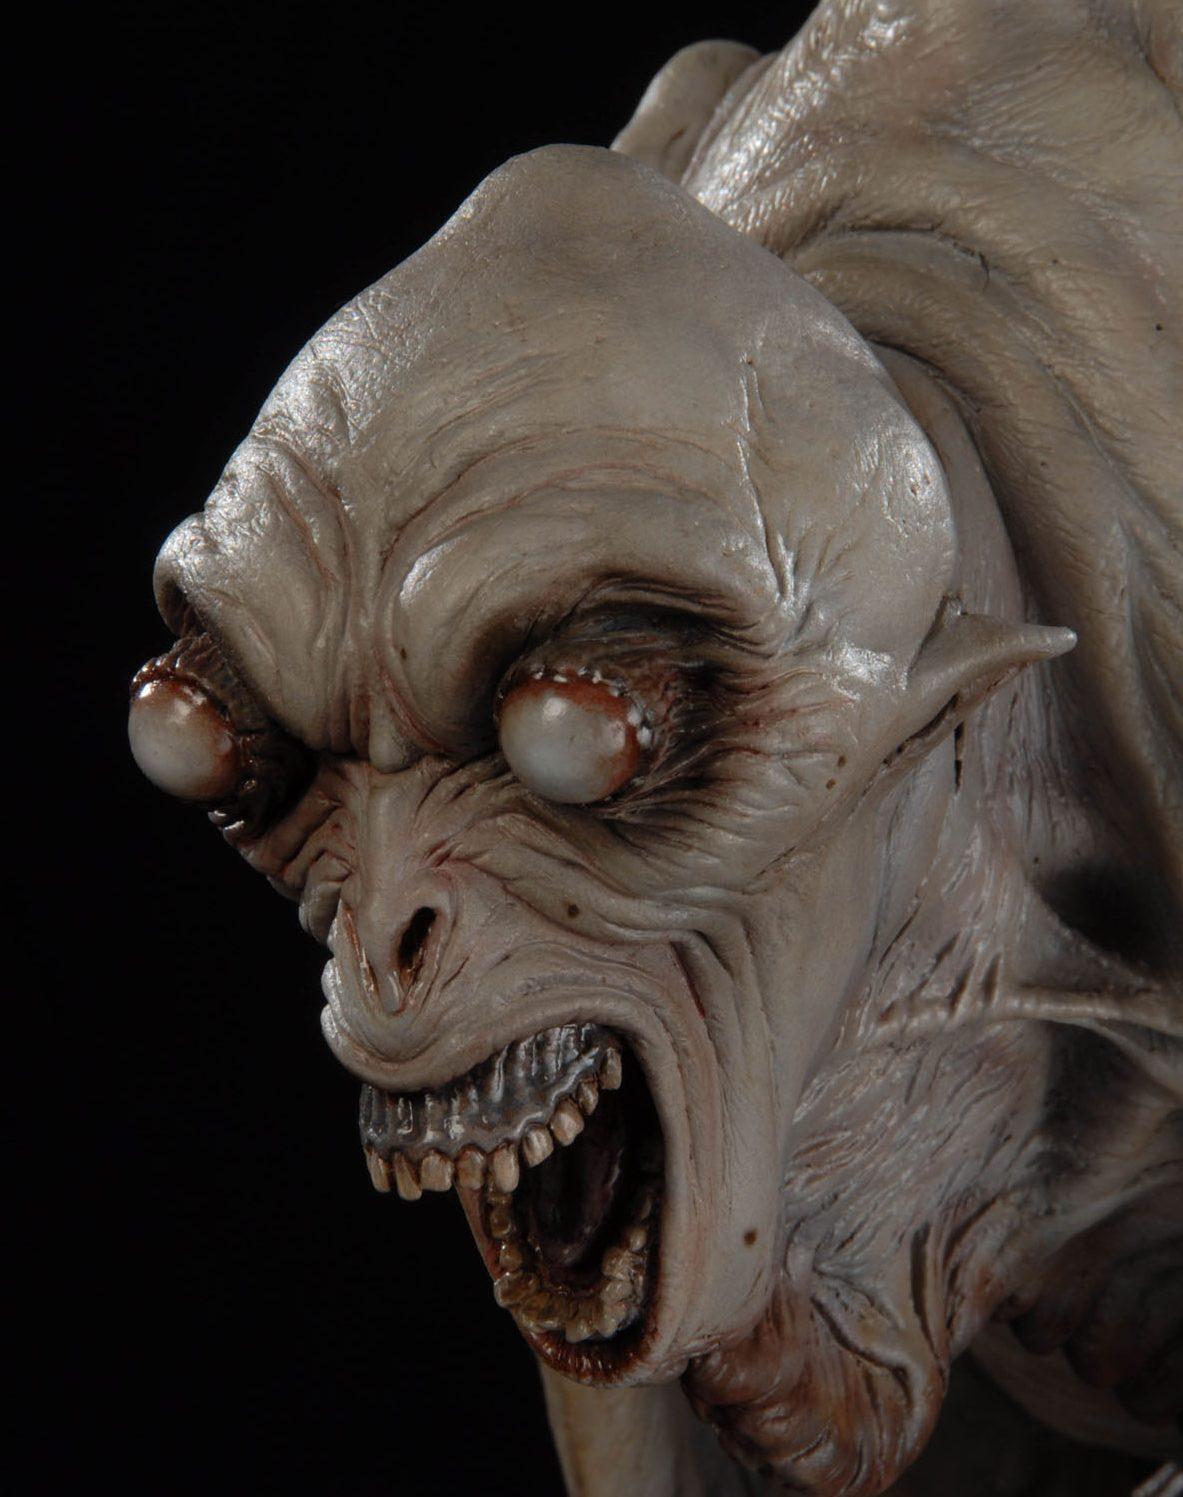 dbatd2 e1584536021926 The 20 Best CGI Movie Monsters Ever